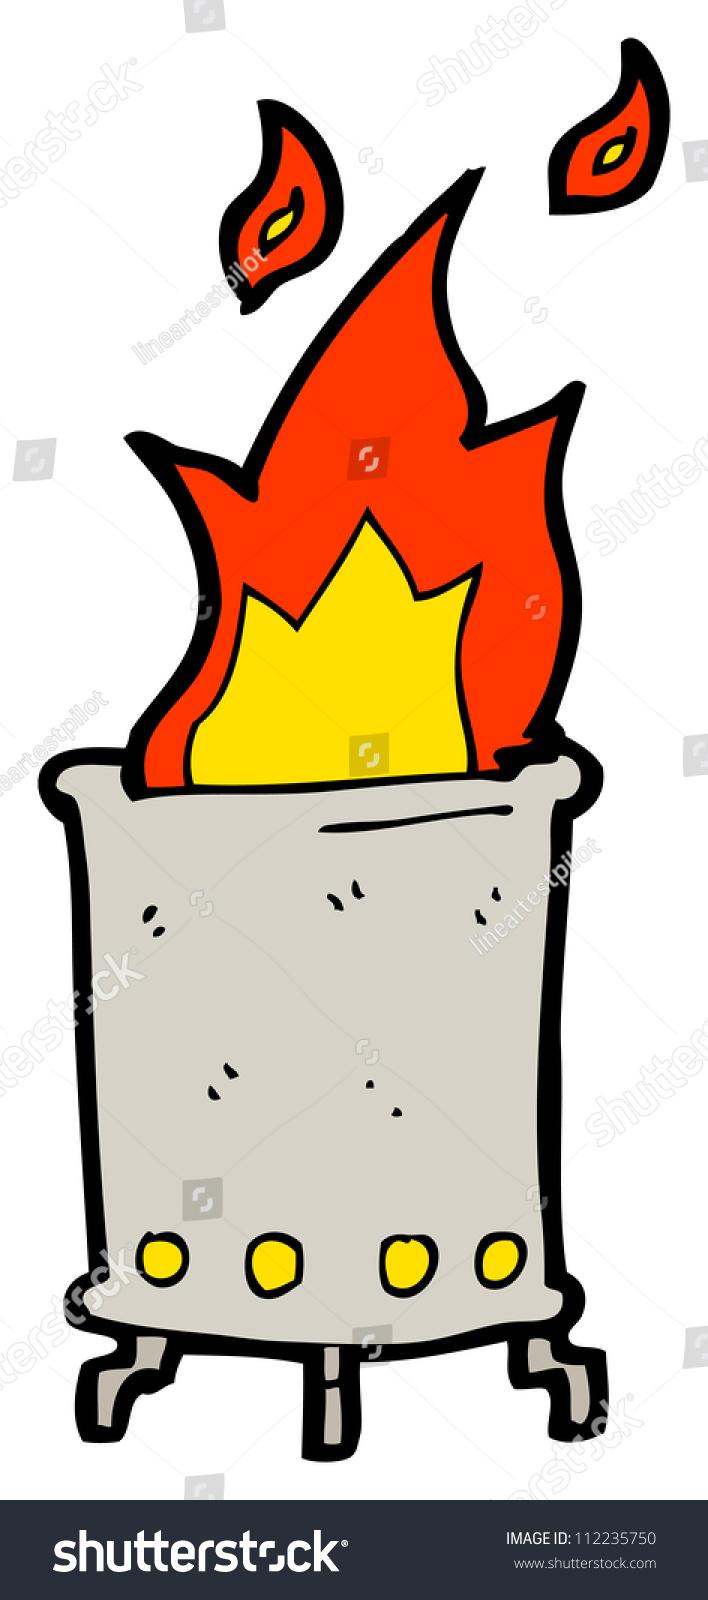 Cartoon Flaming Garbage Can Stock Illustration 112235750 ...